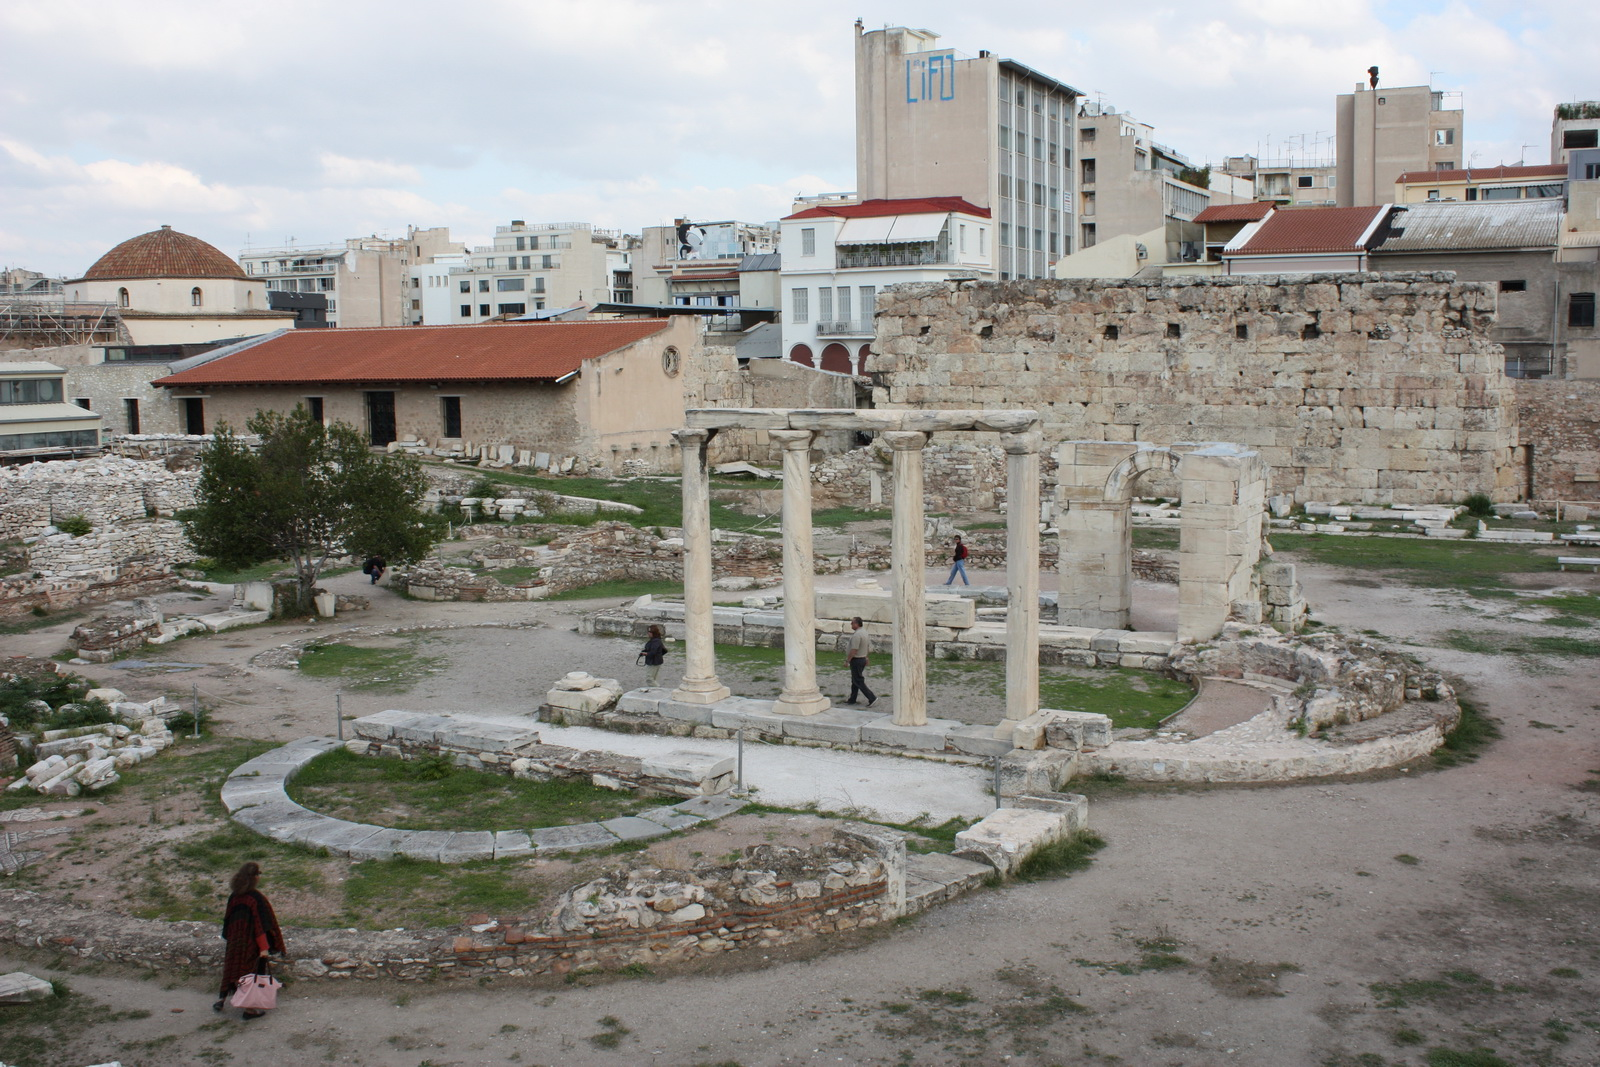 IMG_0616 αρχαια αγορά_resize